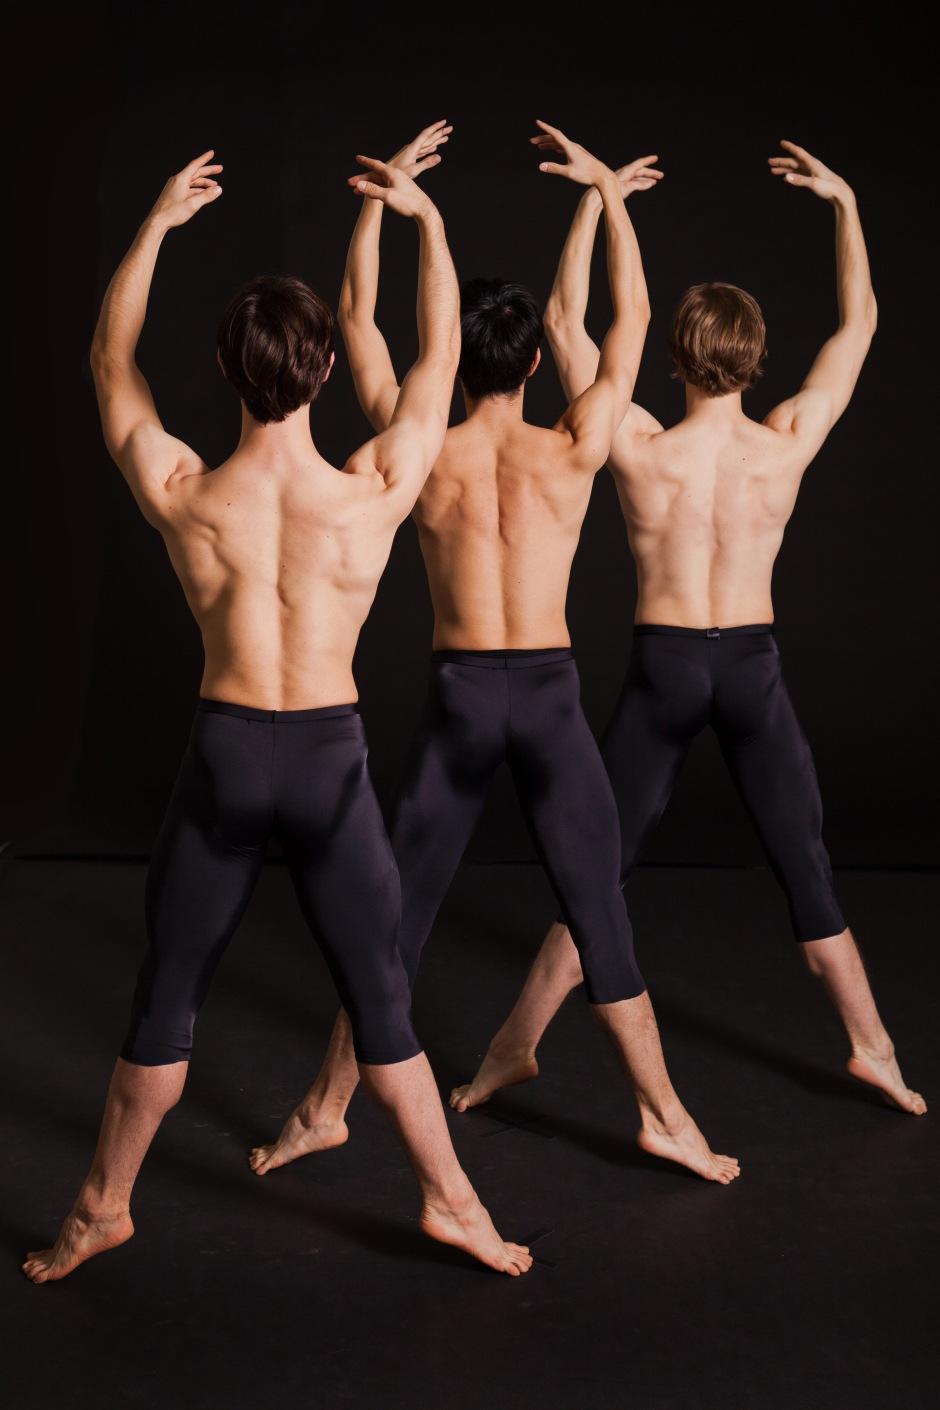 (l-r) Pittsburgh Ballet Theatre's Luca Sbrizzi and Yoshiaki Nakano and Twyla Tharp dancer Nick Coppula. Photo by Duane Rieder.